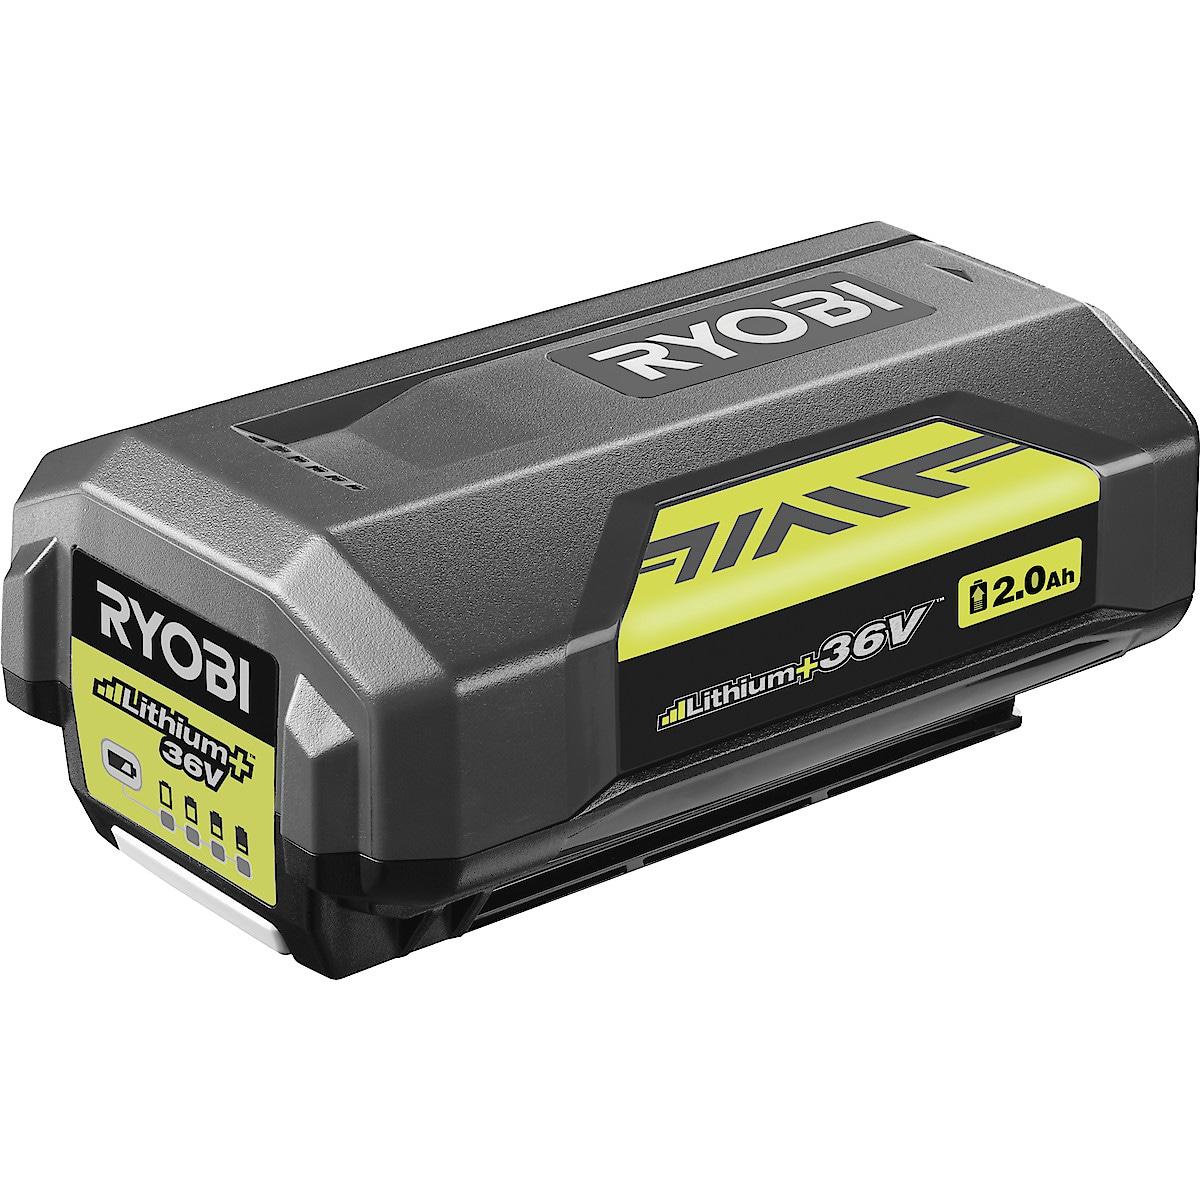 Ryobi batteri 36 V BPL3620D